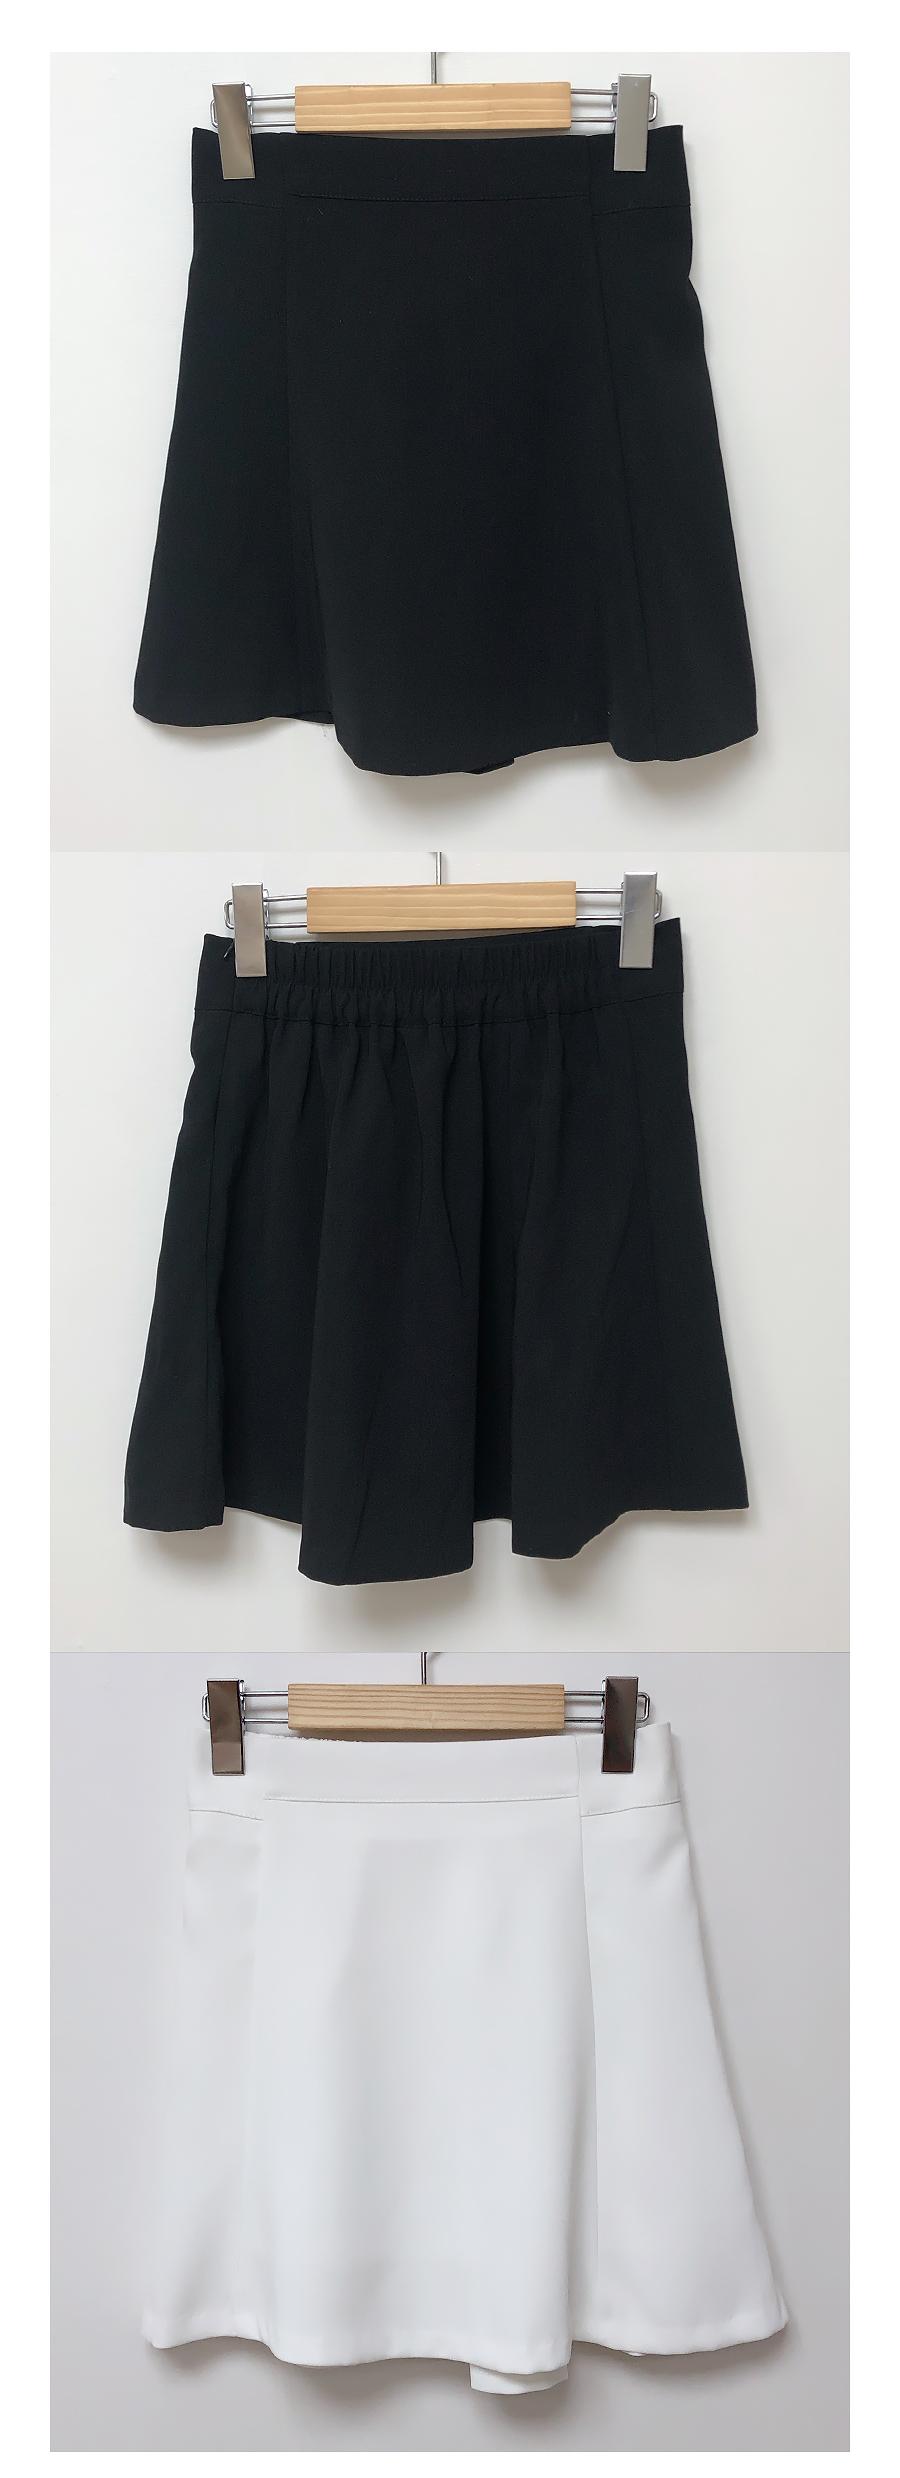 Robin incision skirt